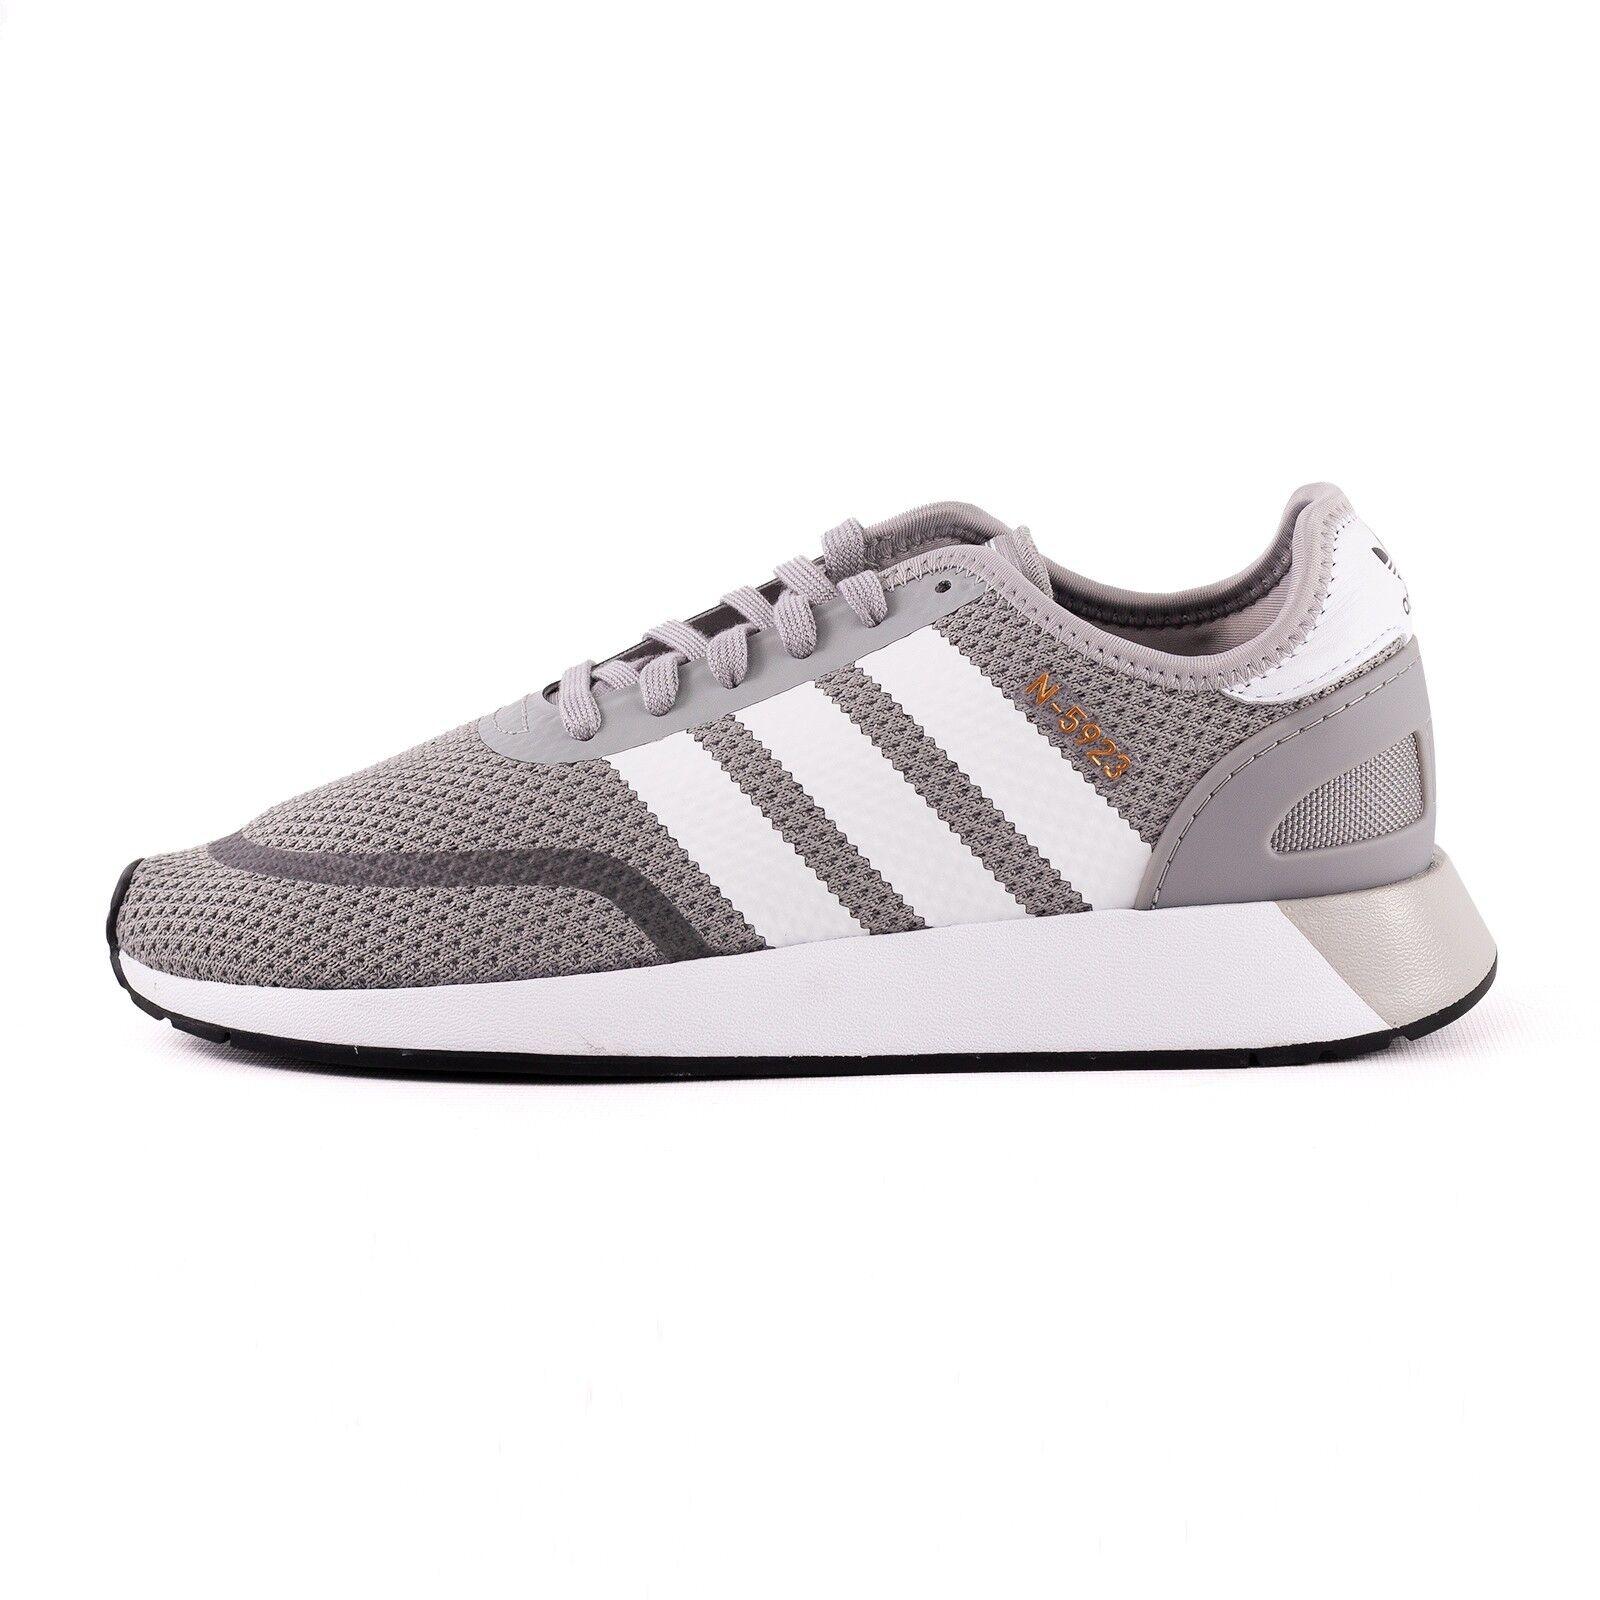 Adidas N-5923 Schuhe Herren Sneaker grau weiss 51434